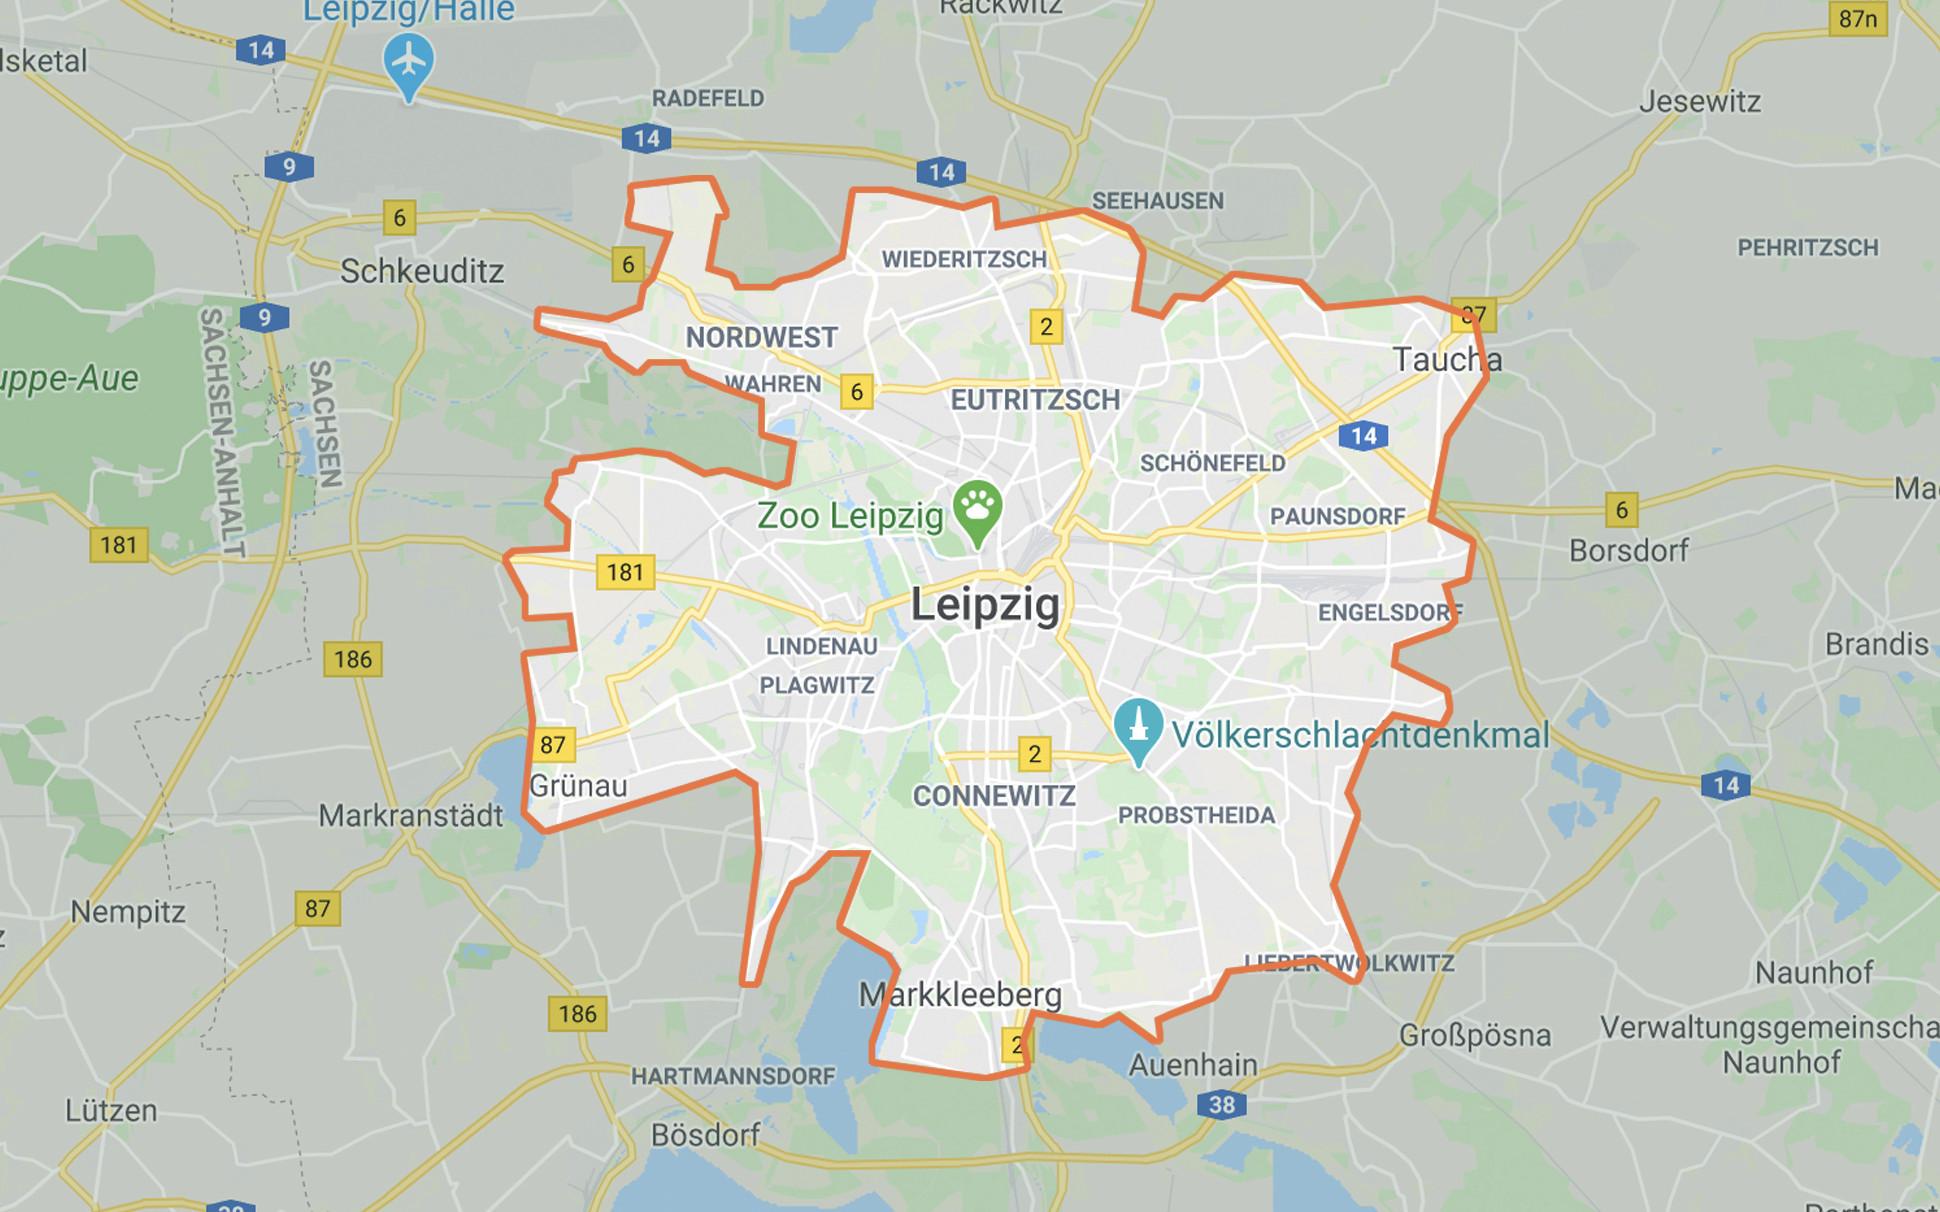 CleverShuttle Orange in Leipzig